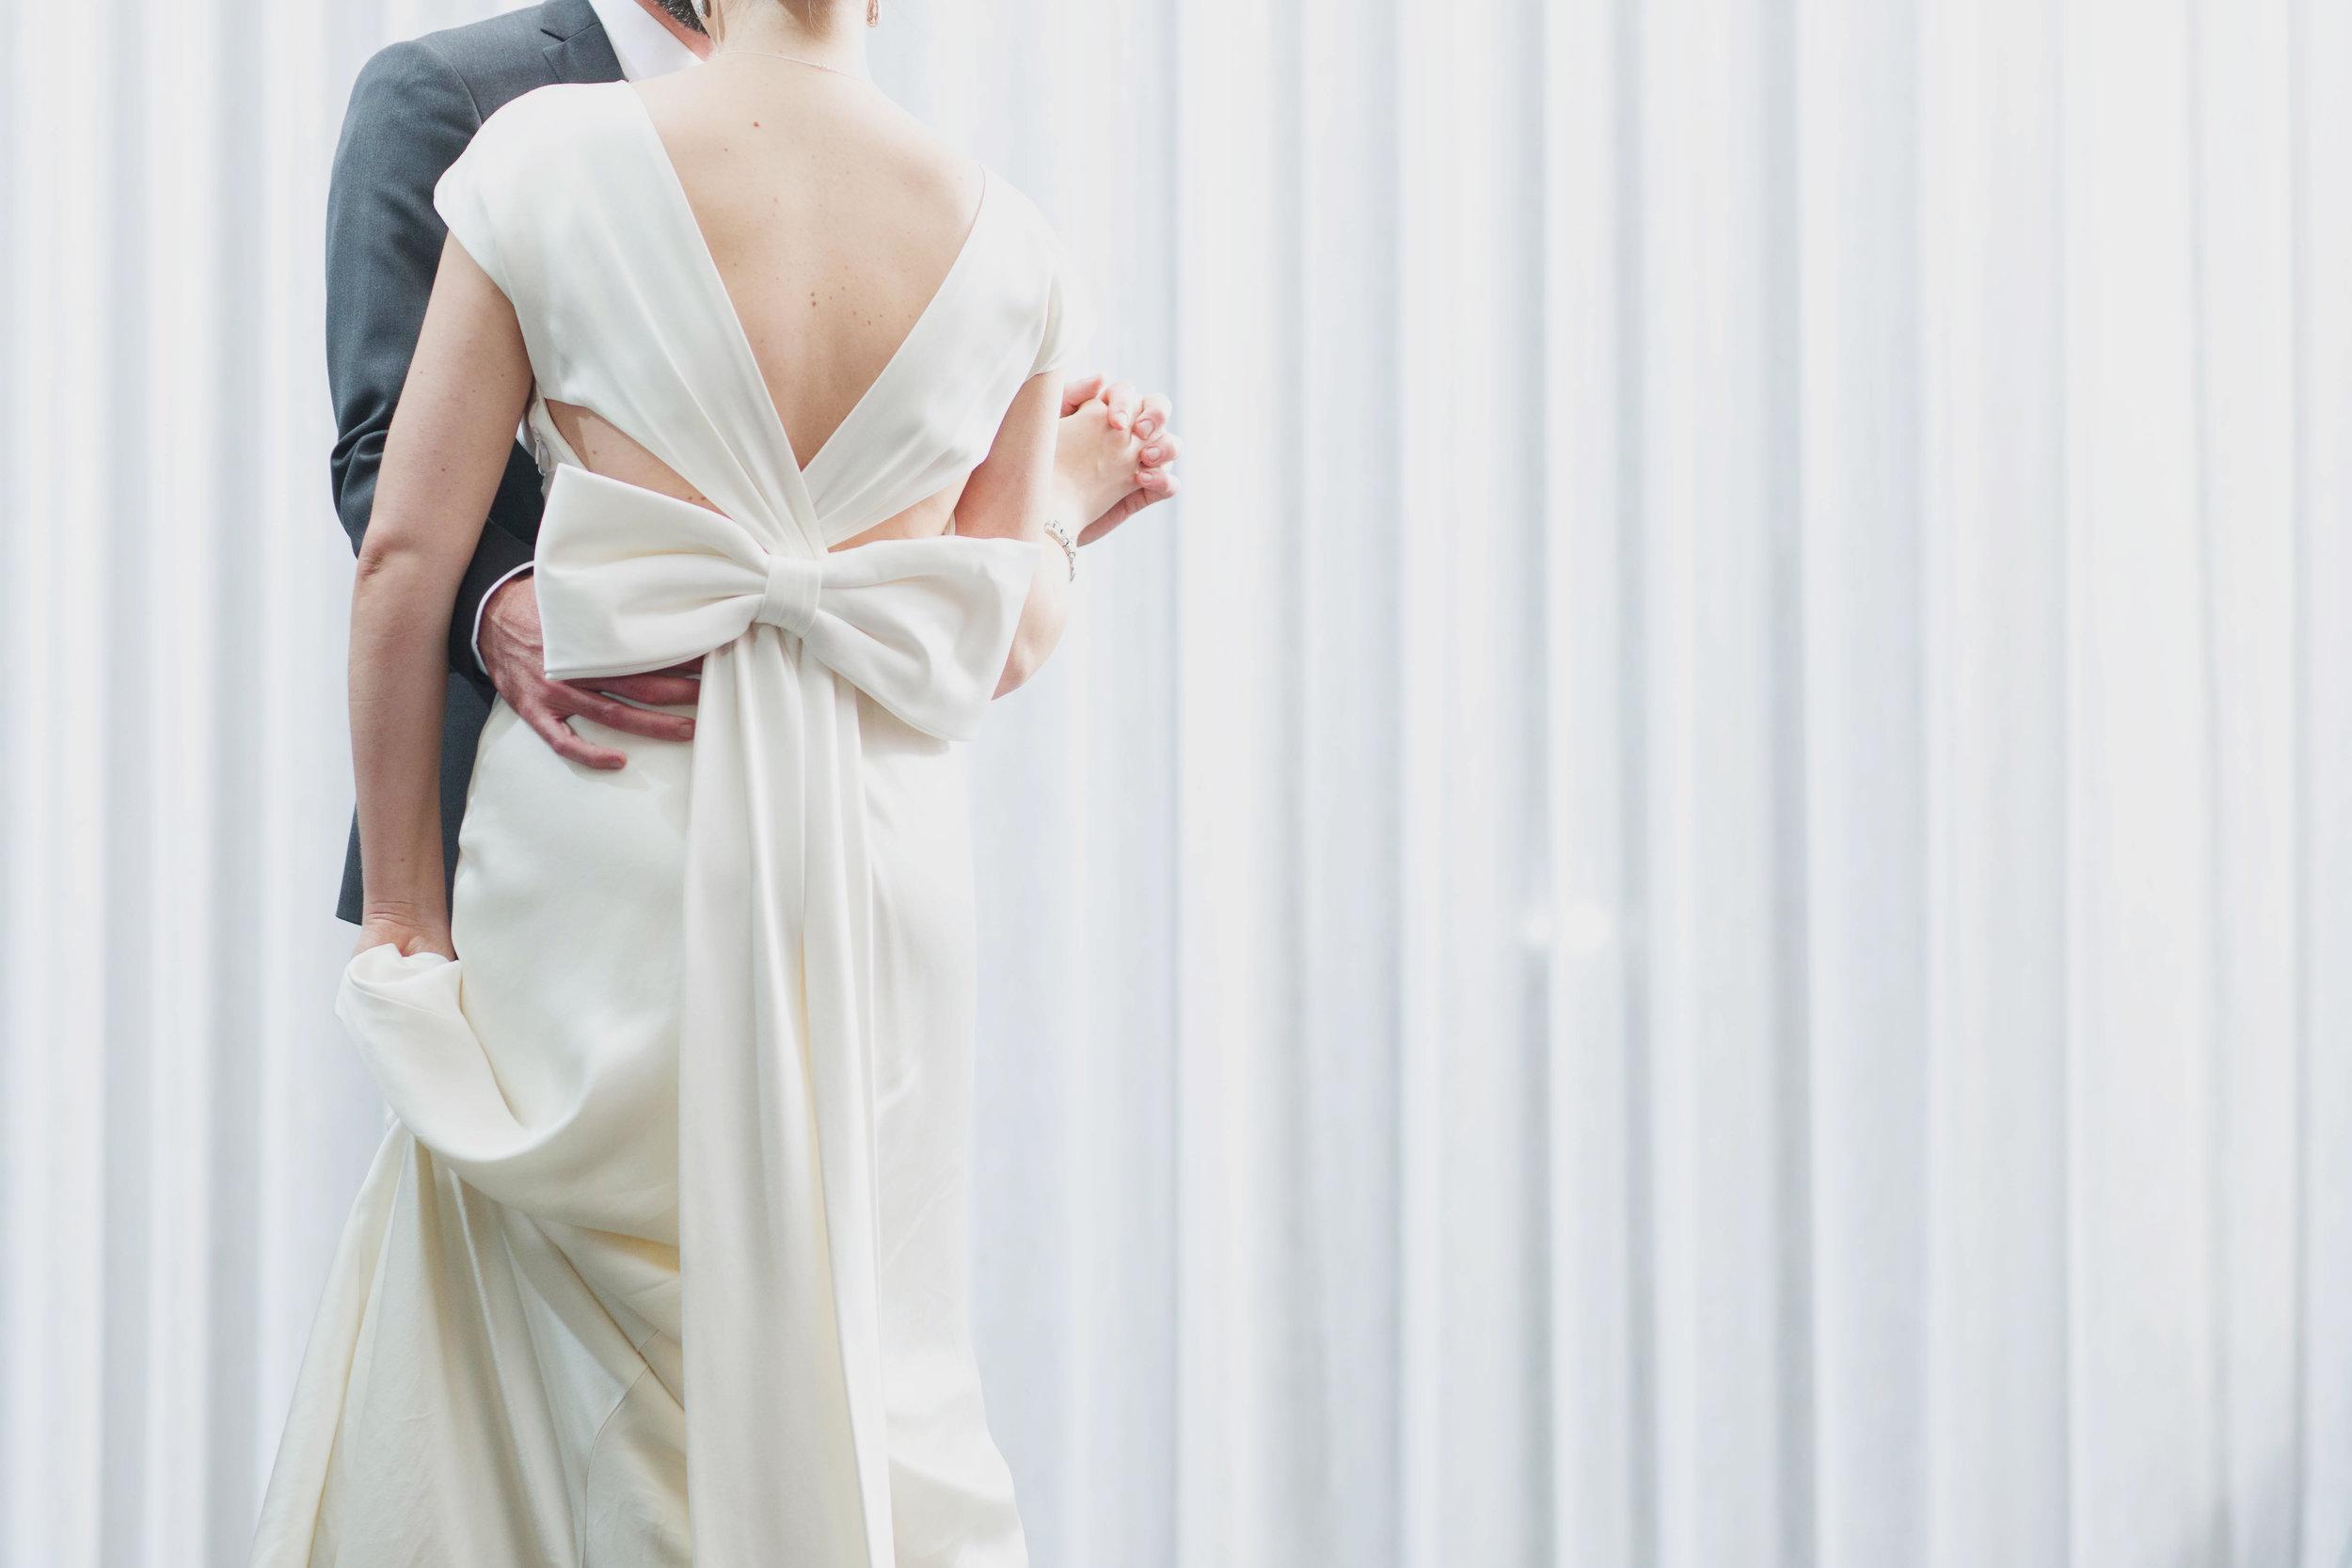 Simply-Charming-Socials_Atlanta-Wedding-Planner_Our-Labor-Of-Love_Emily-and-Jon_26.jpg